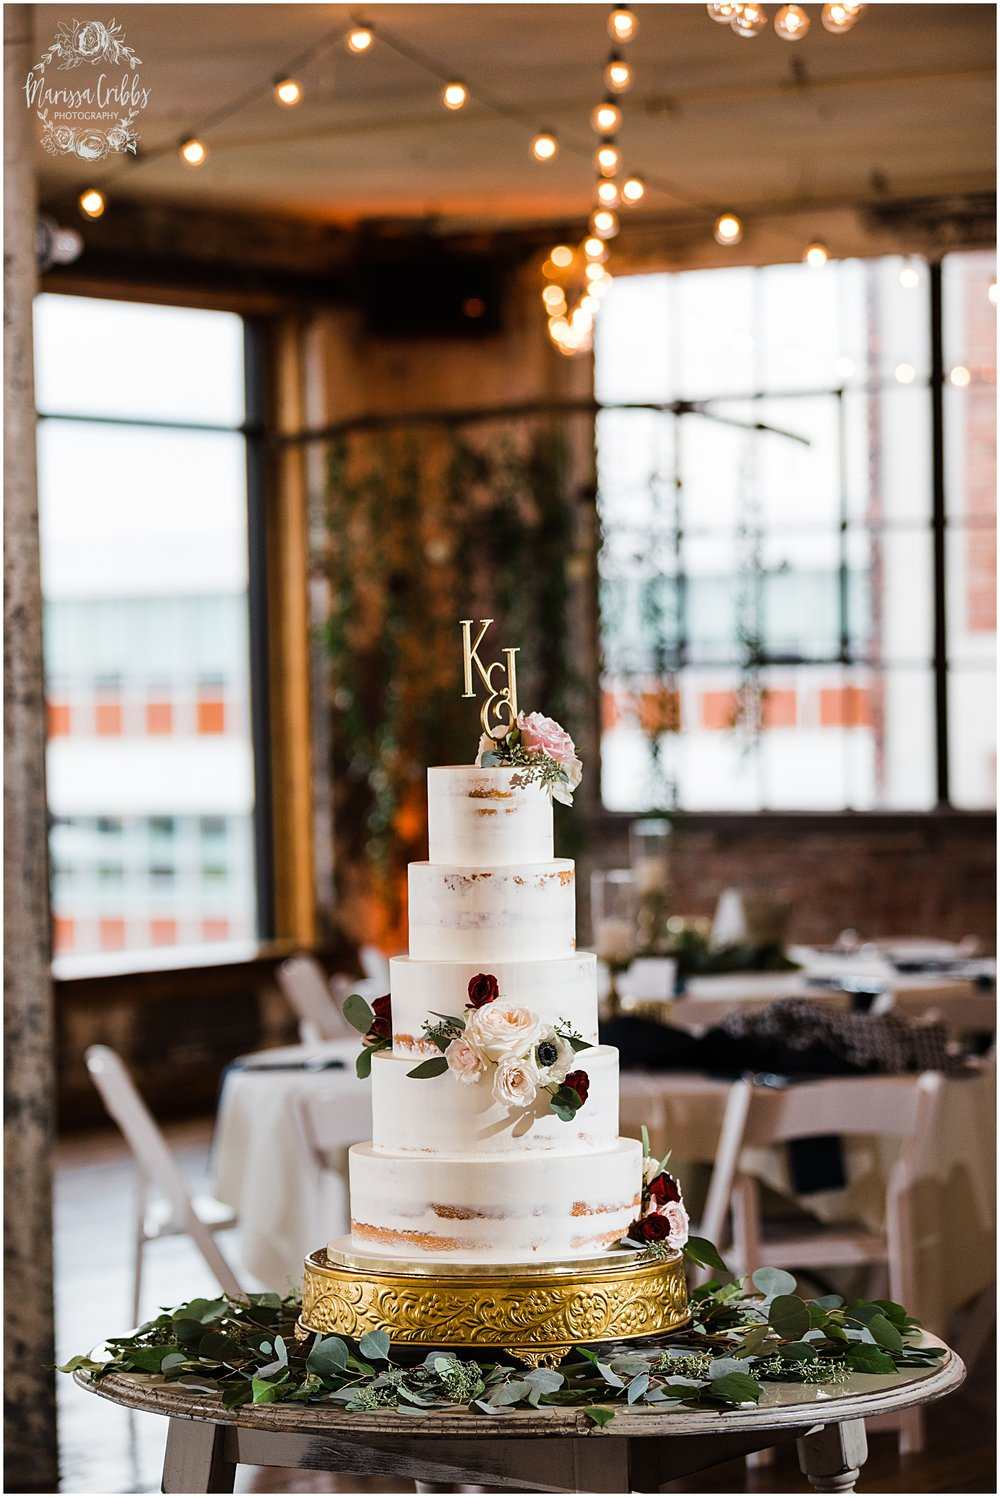 BAUER WEDDING   KELSEA & JUSTIN   MARISSA CRIBBS PHOTOGRAPHY_6573.jpg